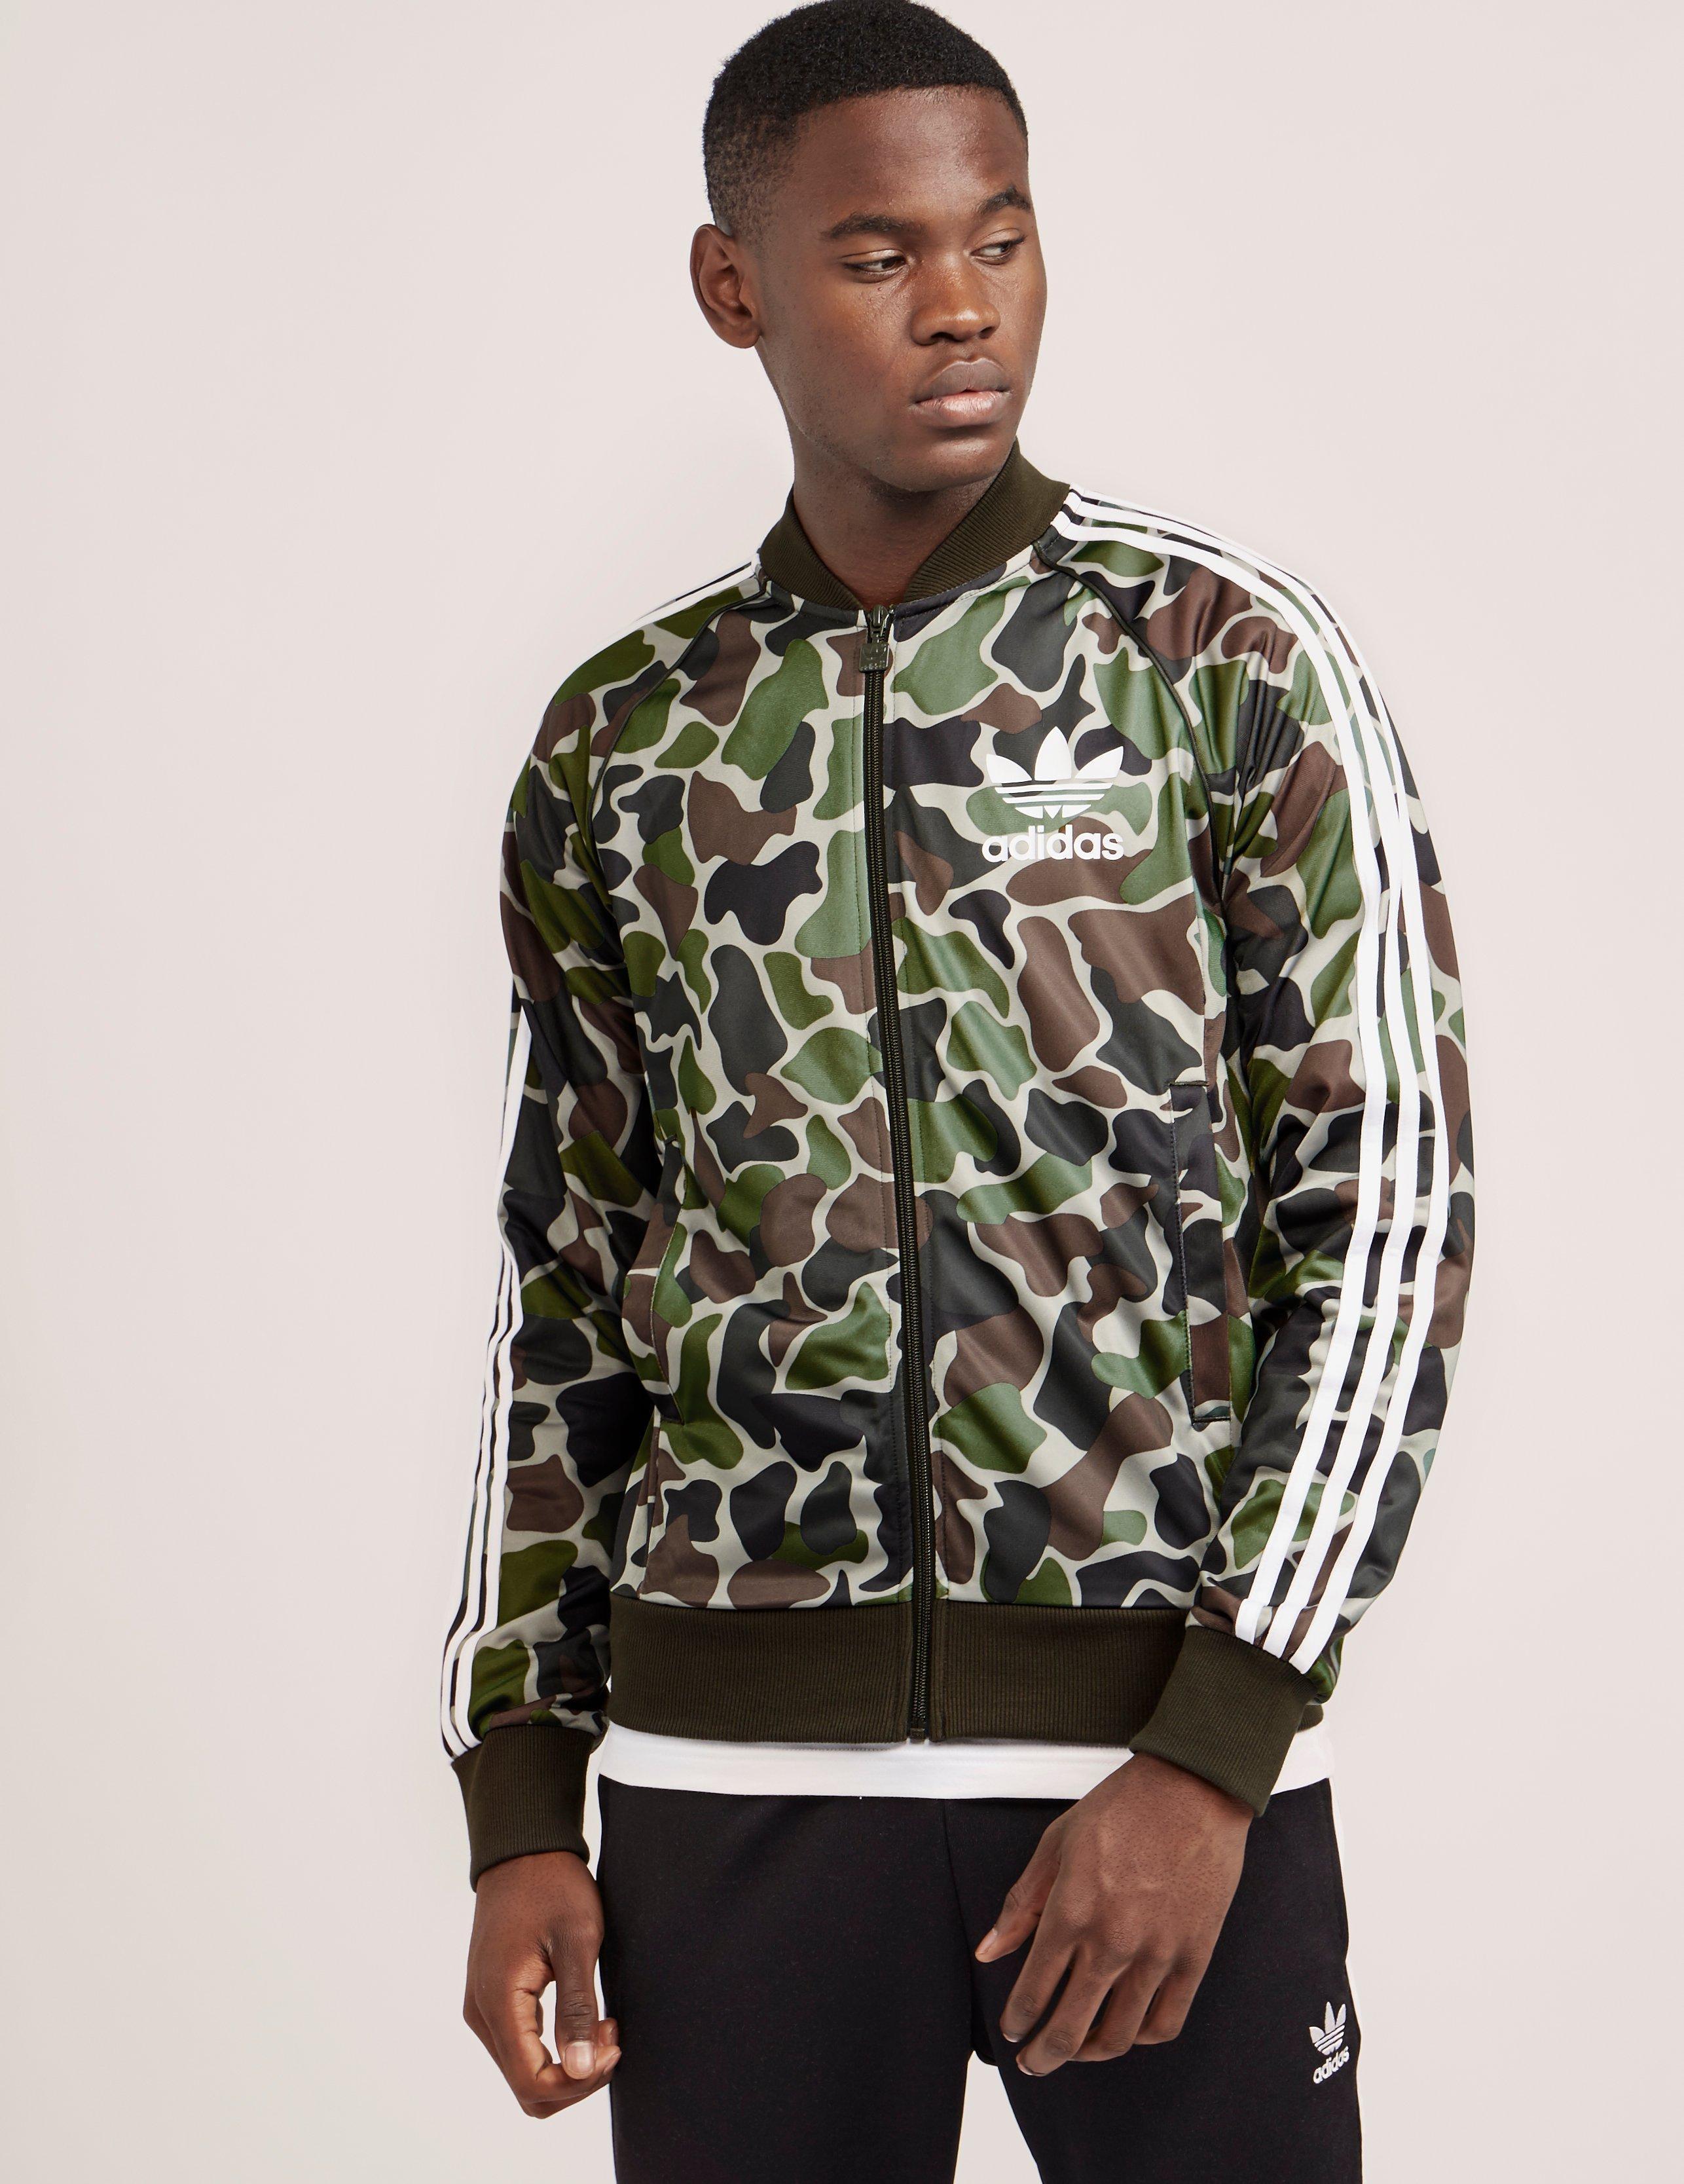 Lyst adidas Originals hombre  Superstar Track Top Verde Camuflaje